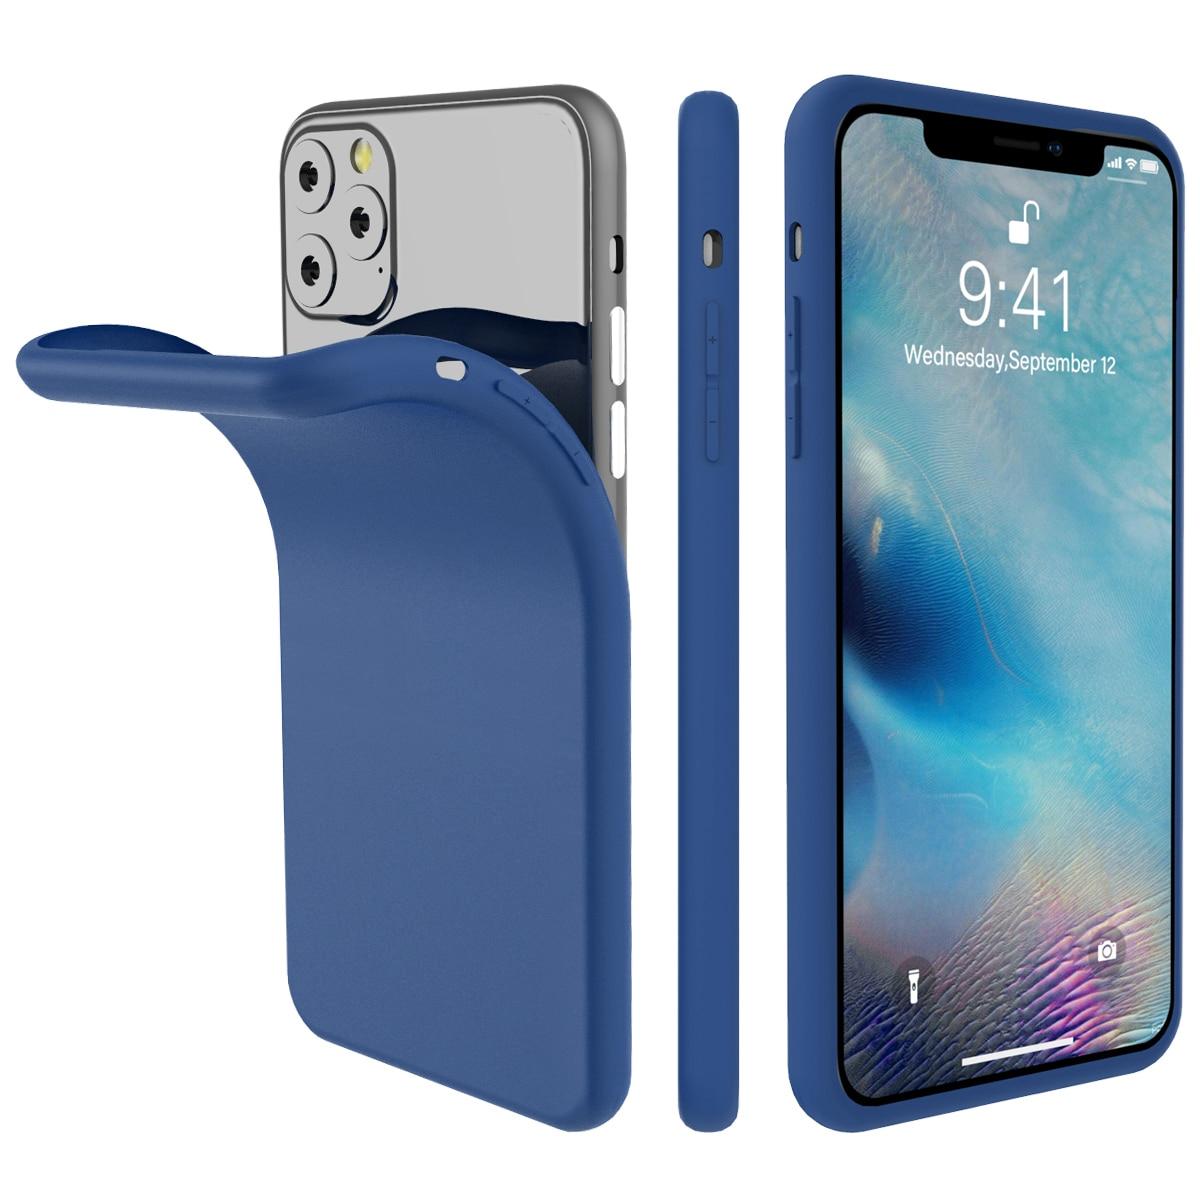 Torubia Silicone Case for iPhone 11/11 Pro/11 Pro Max 28